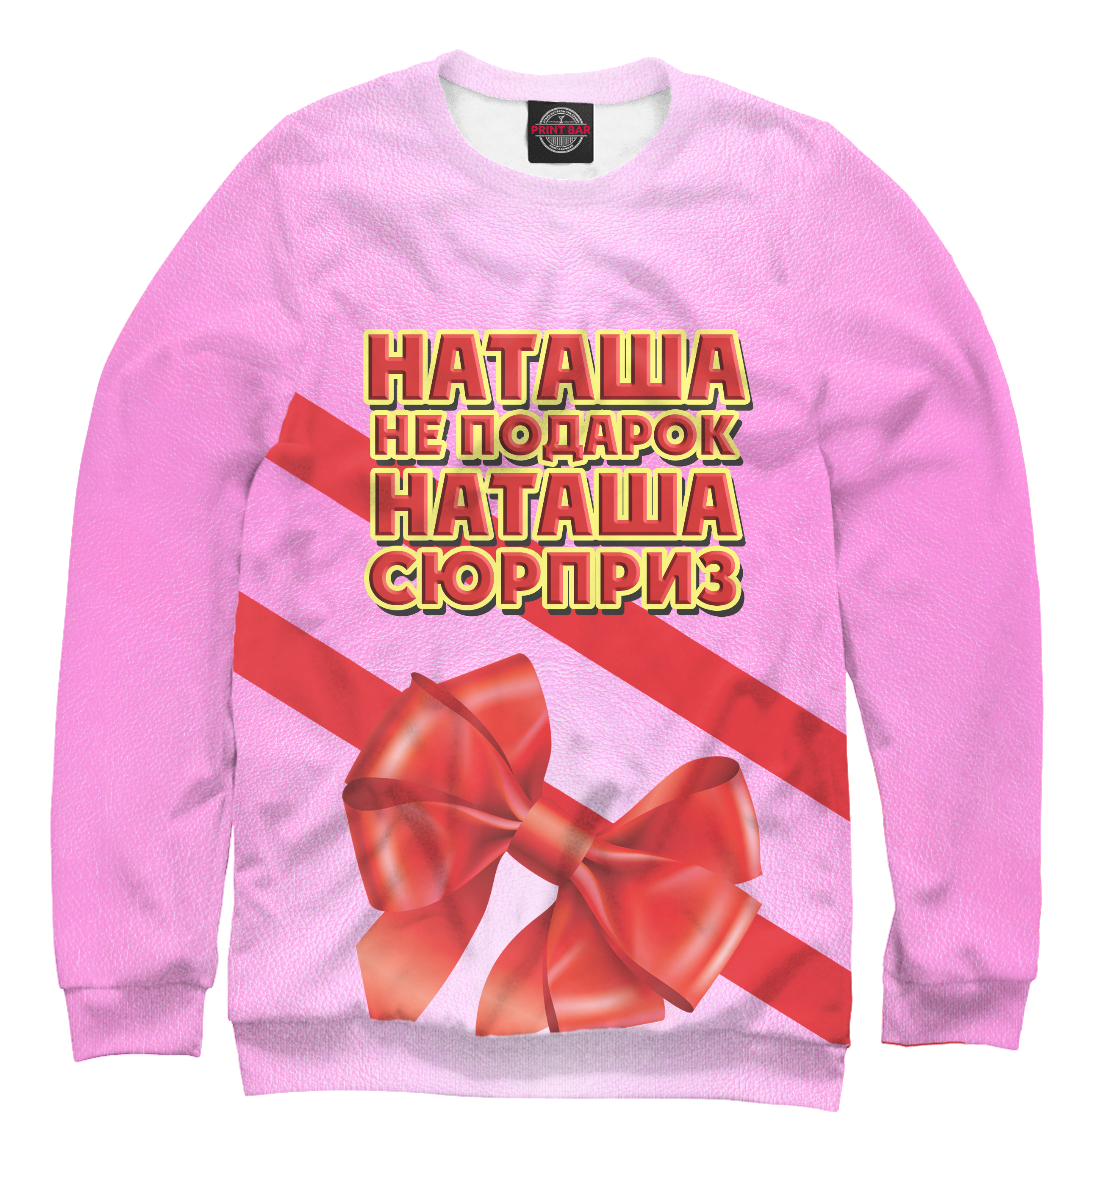 Купить Наташа не подарок, Printbar, Свитшоты, IMR-799361-swi-2